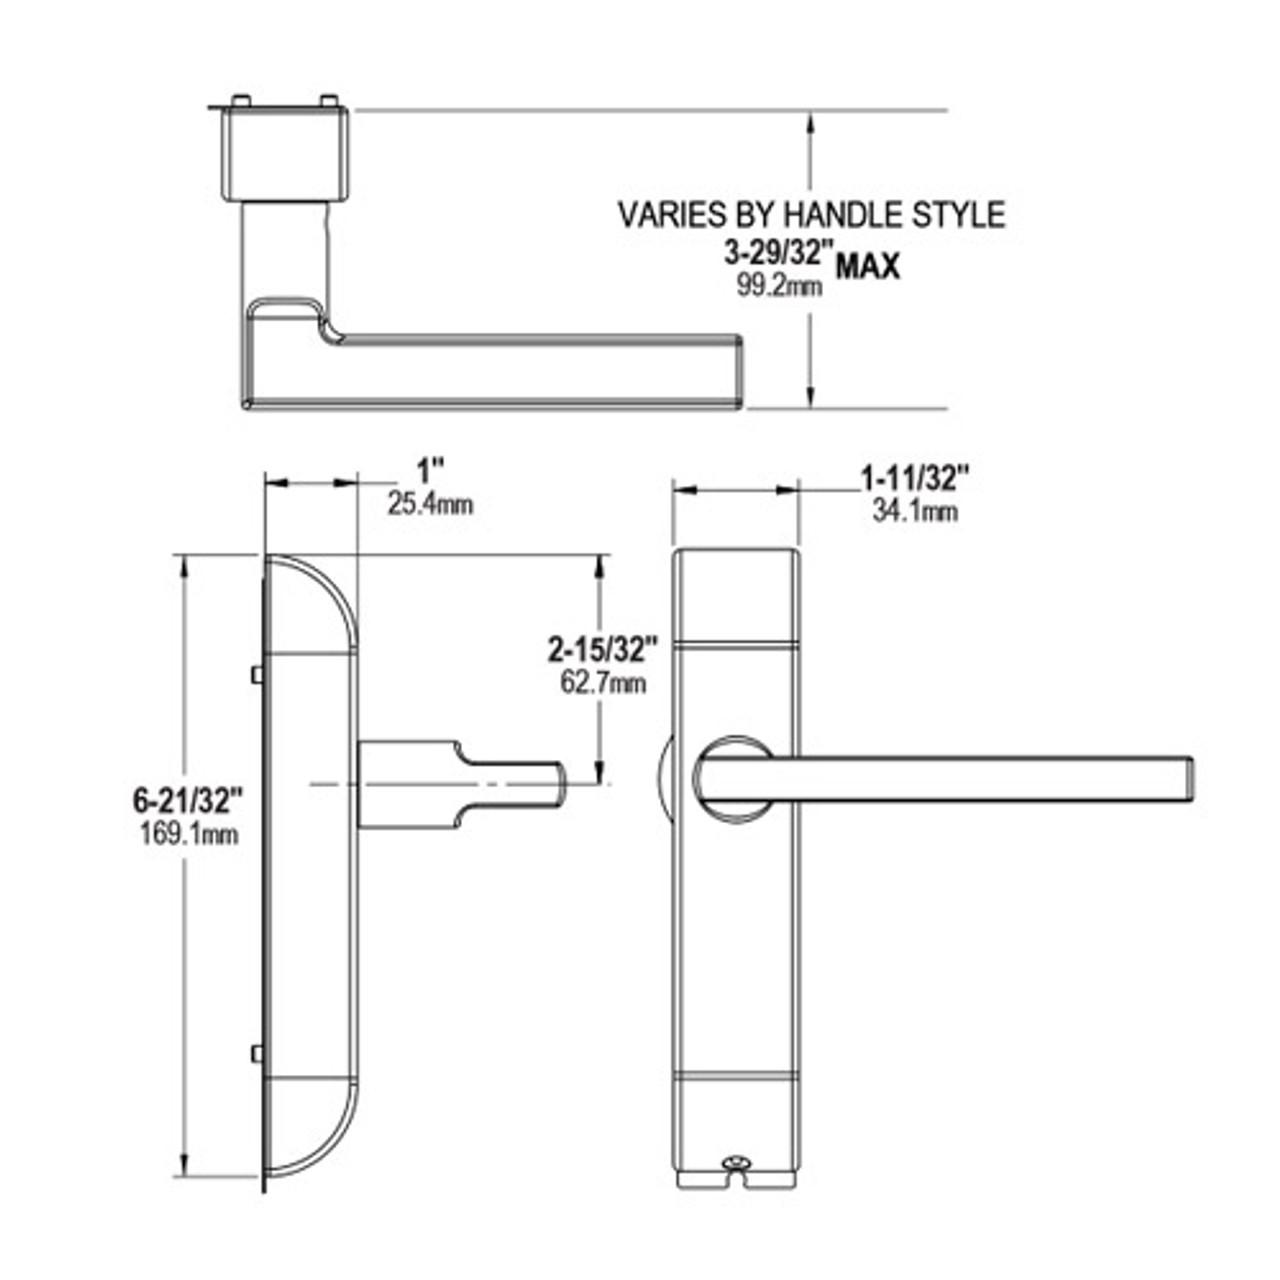 4600M-MW-612-US32 Adams Rite MW Designer handle Dimensional View